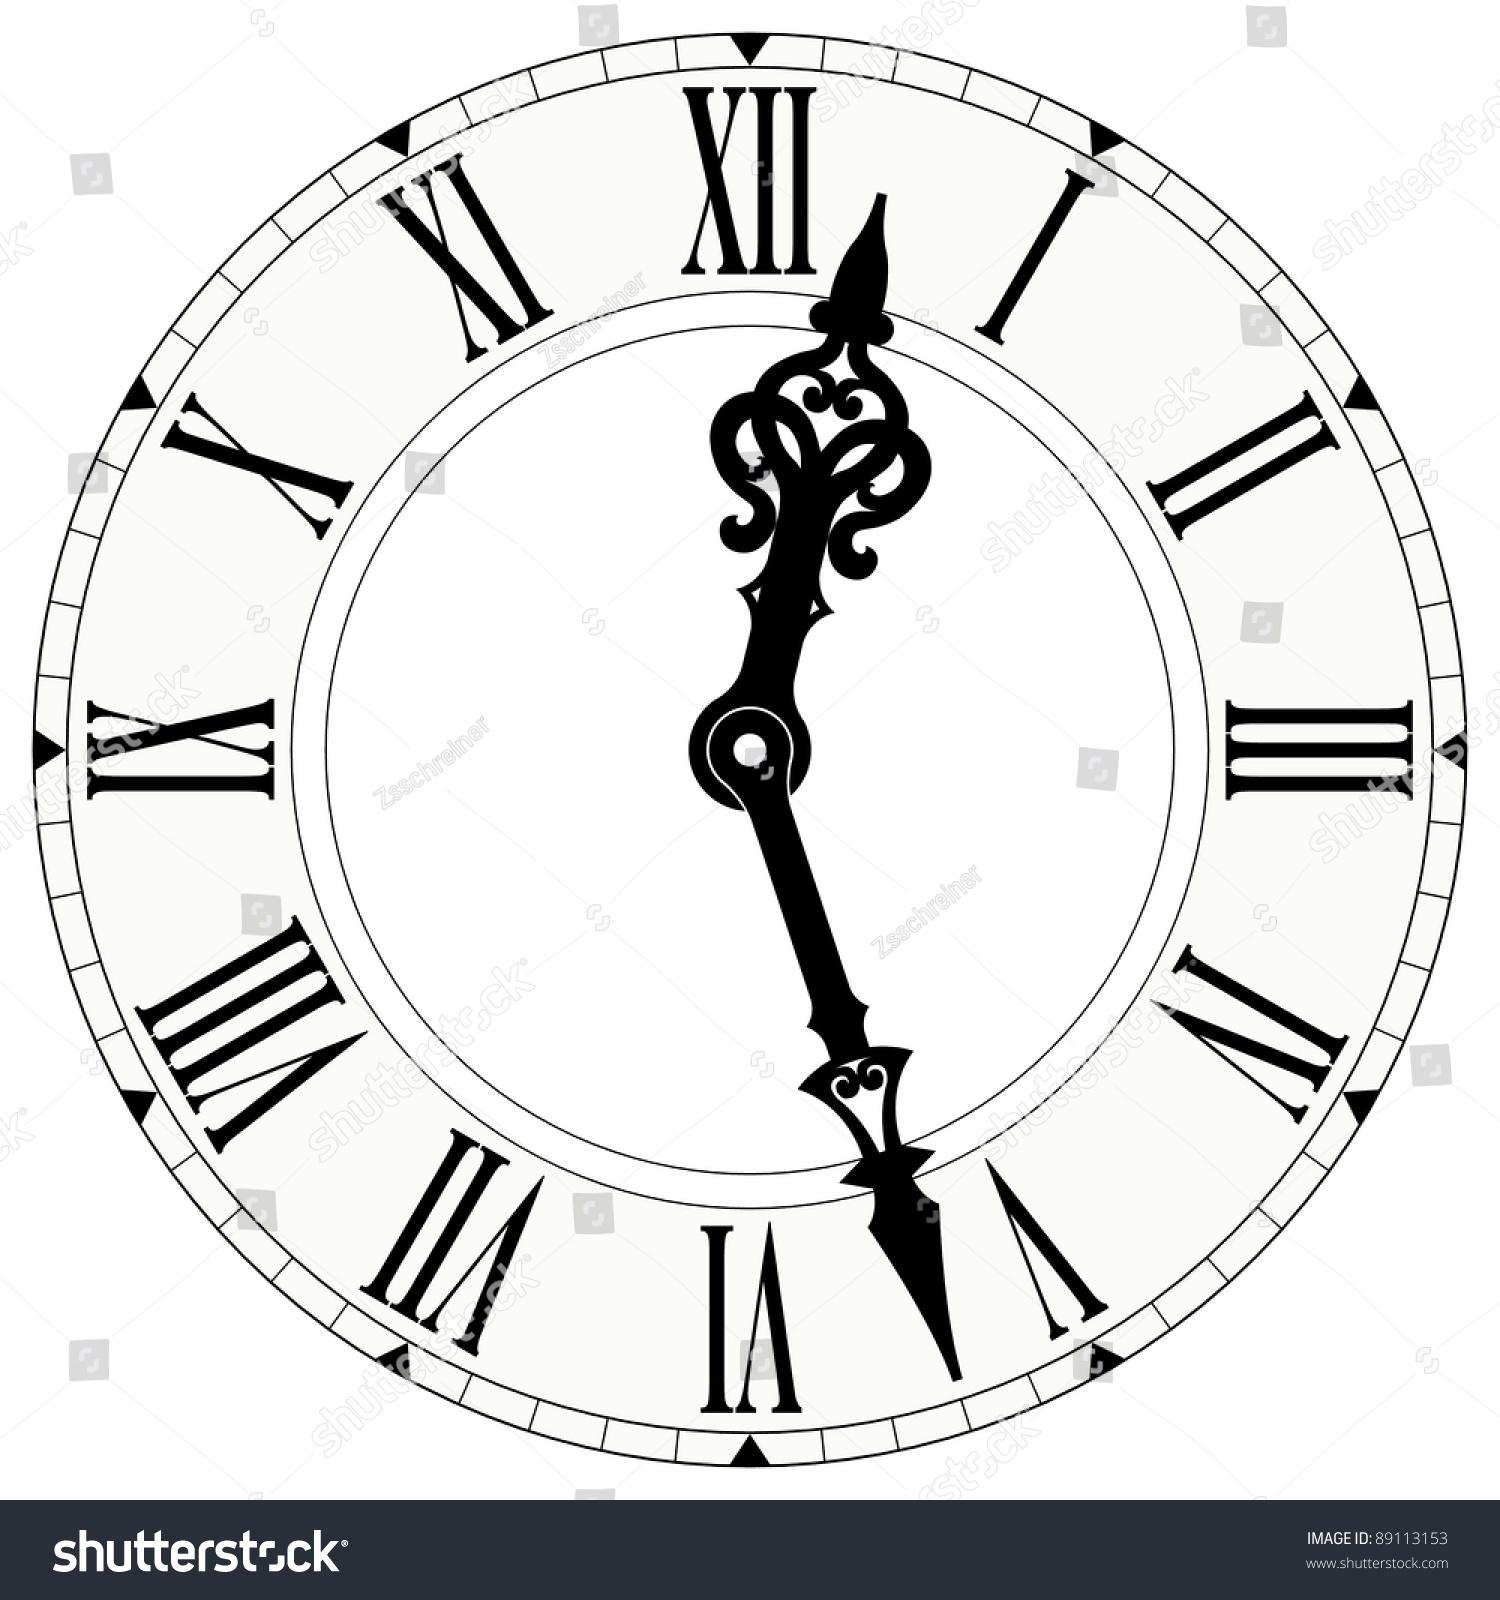 Illustration Roman Numeral Clock Stock Illustration